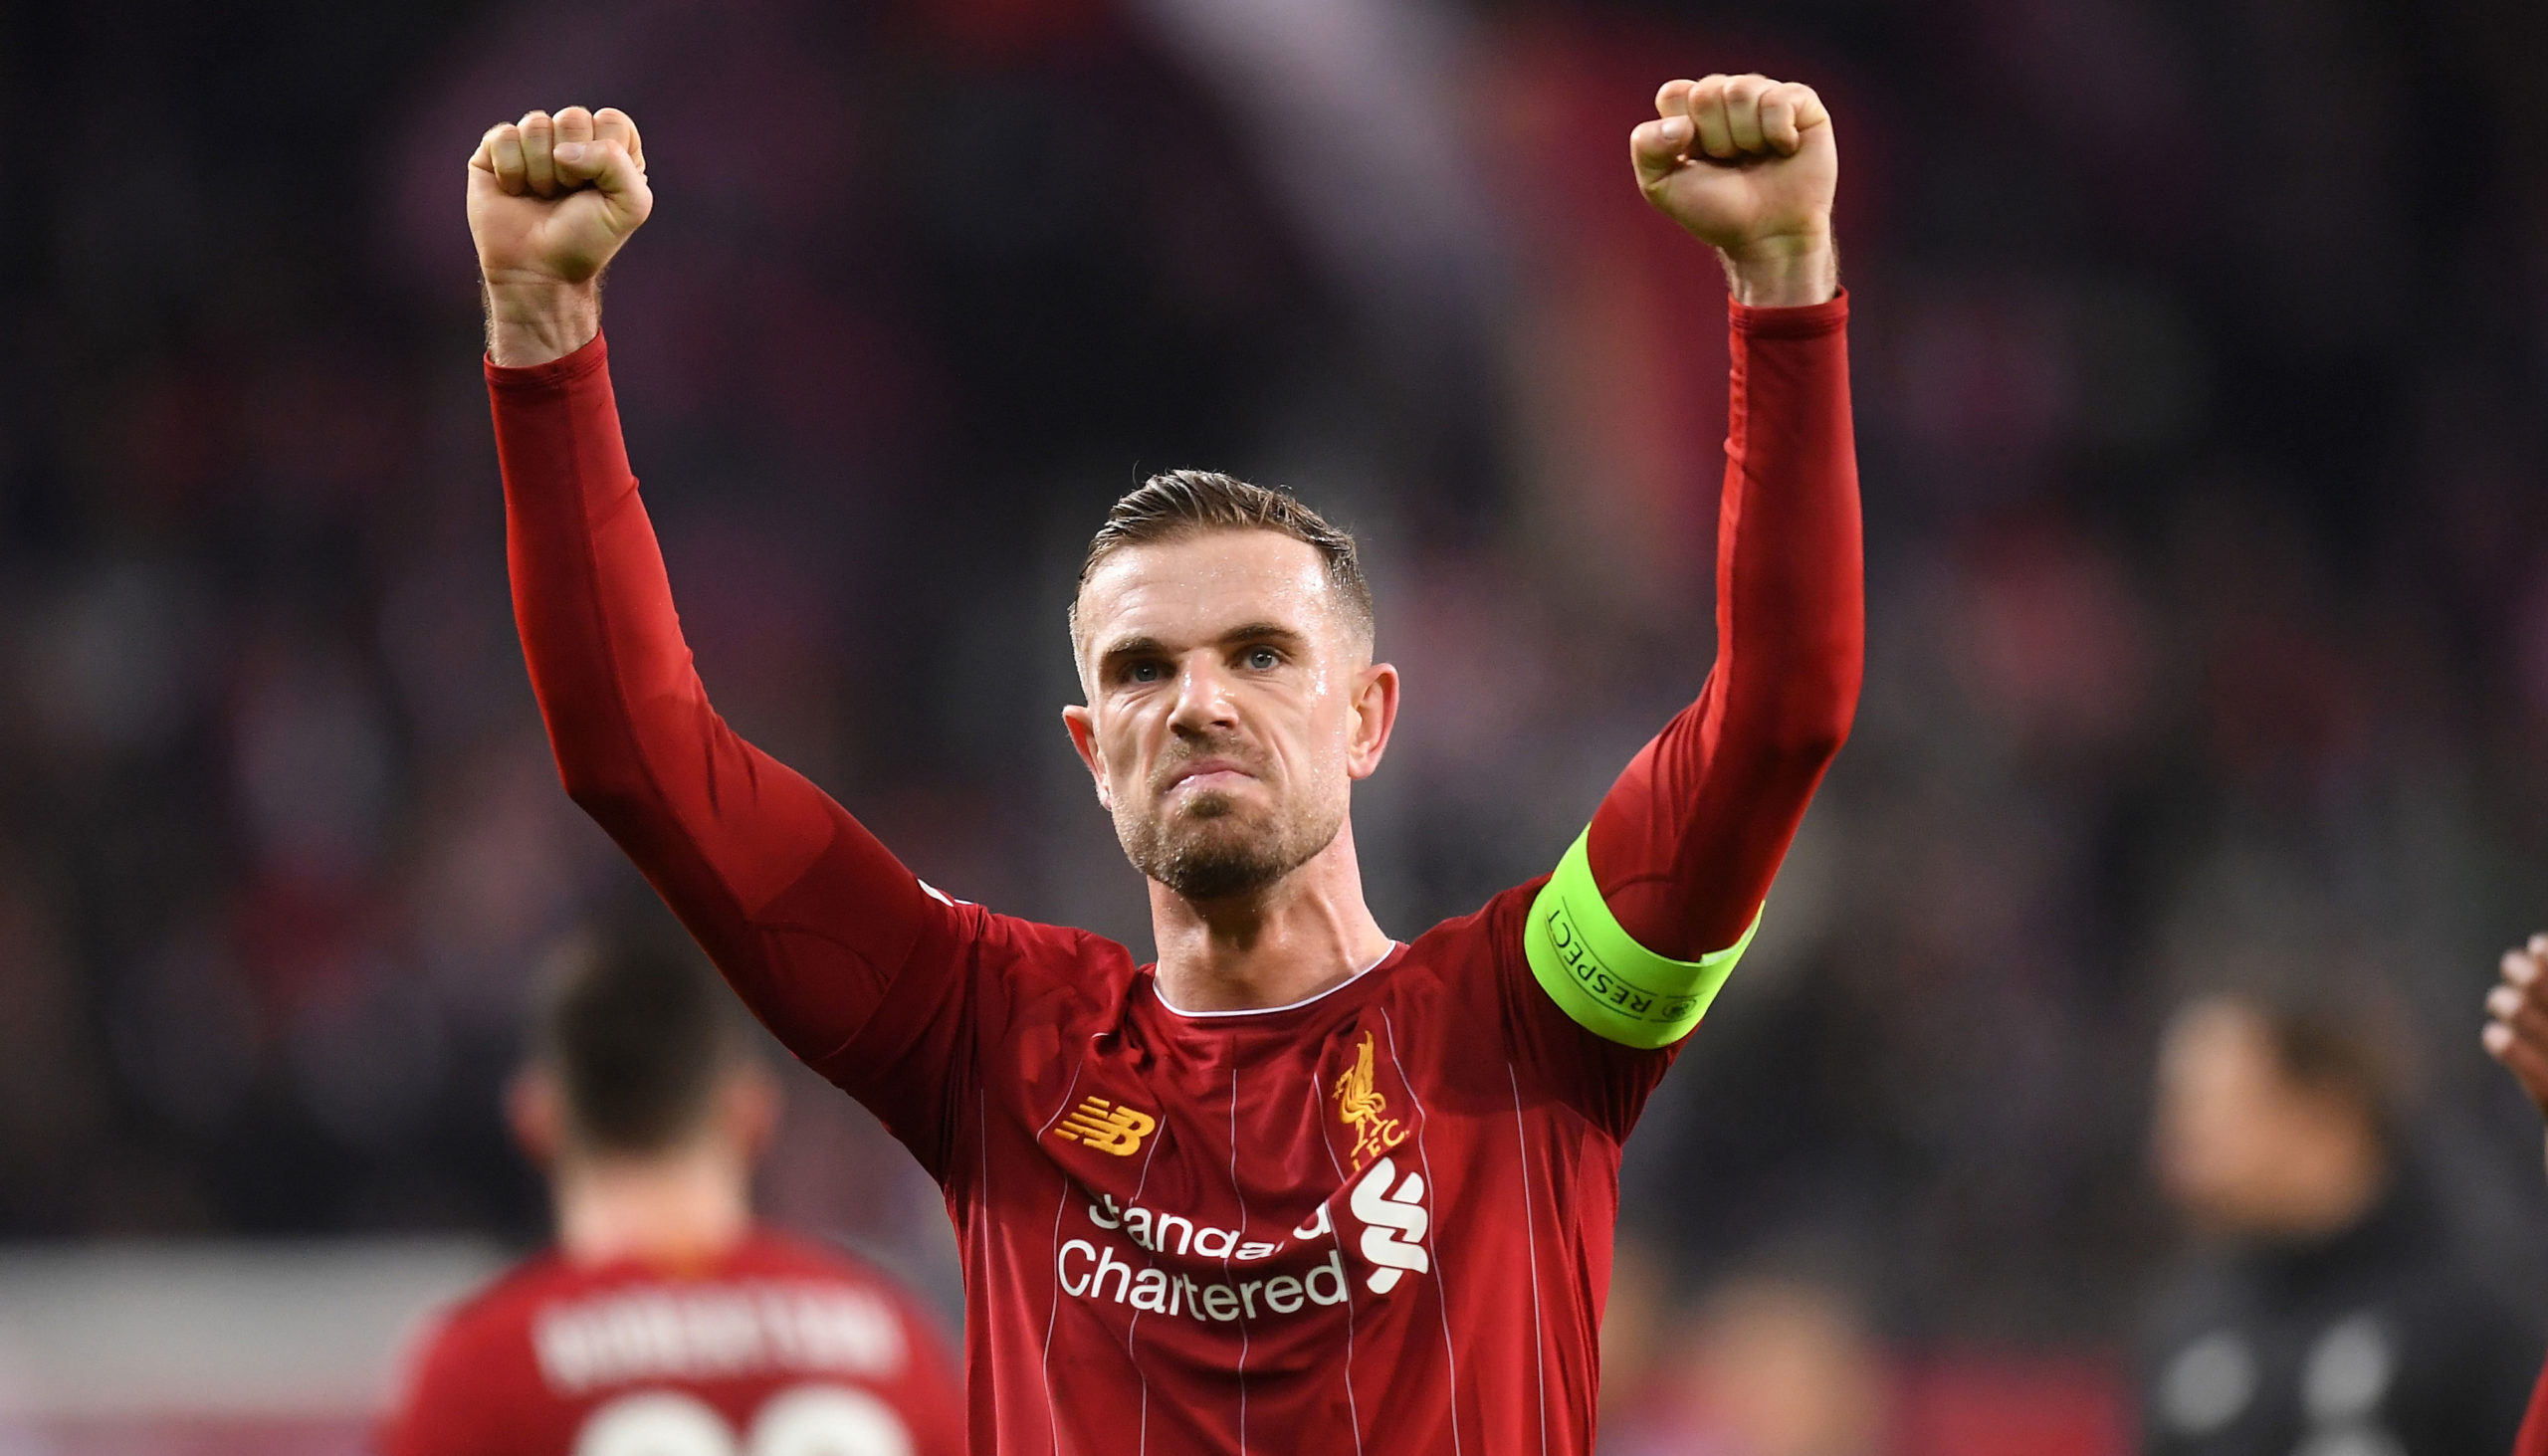 Premier League winner predictions: Reds 4/1 to stay unbeaten